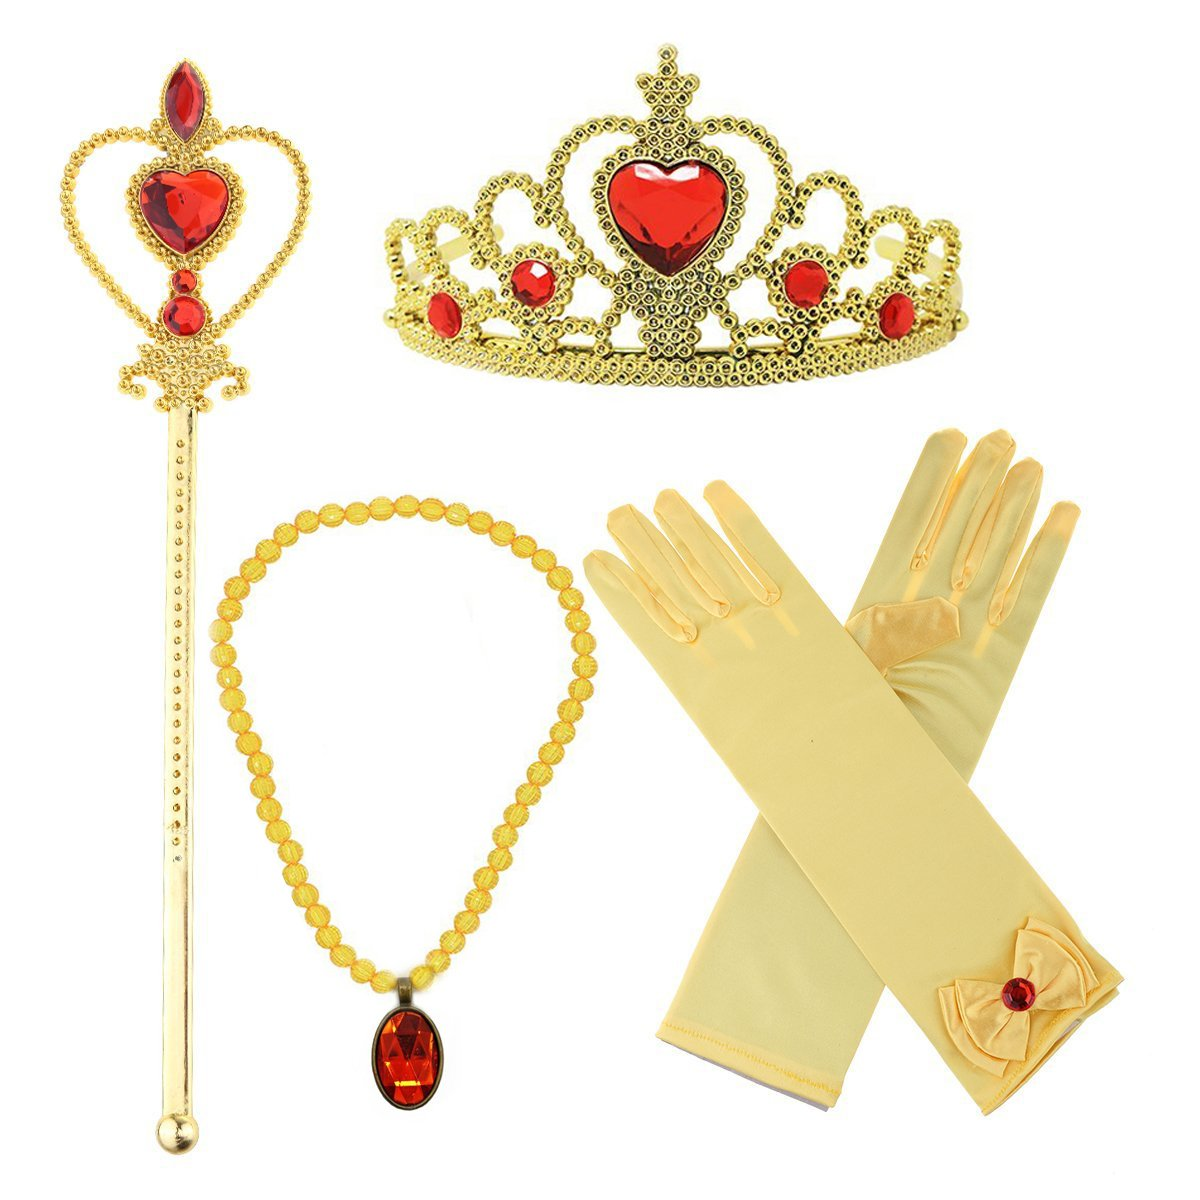 Hpwai Girls Princess Belle Dress Up Costume Accessories,Crown Necklace Wand Gloves Halloween Set